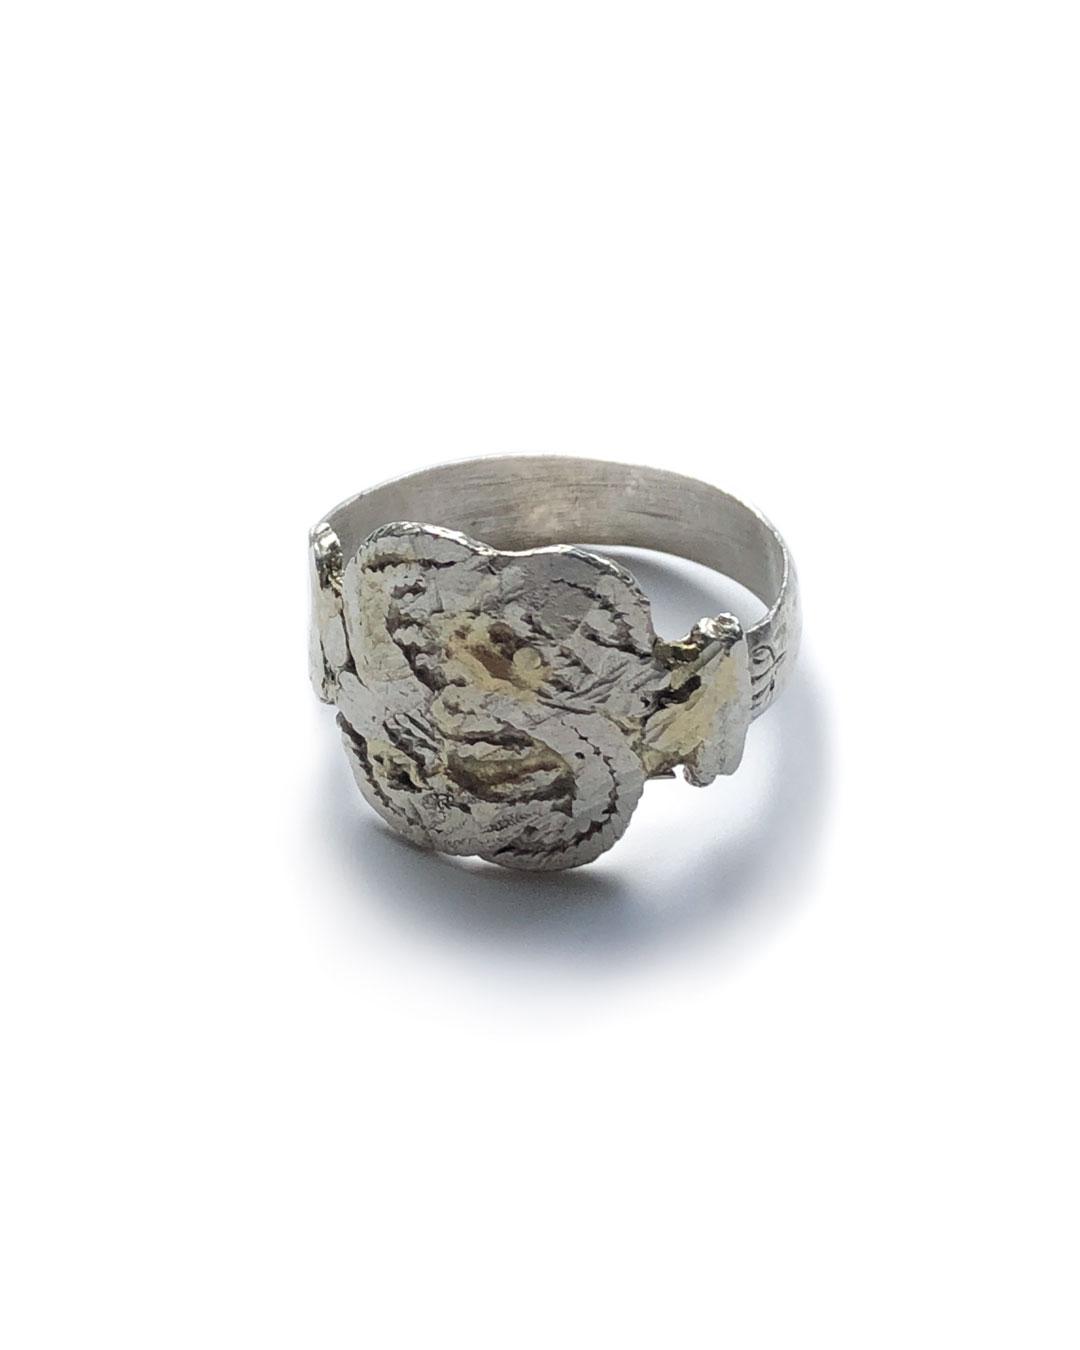 Chequita Nahar, Matti, 2017, ring; silver, 24ct gold, 22 x 22 x 15 mm, €445